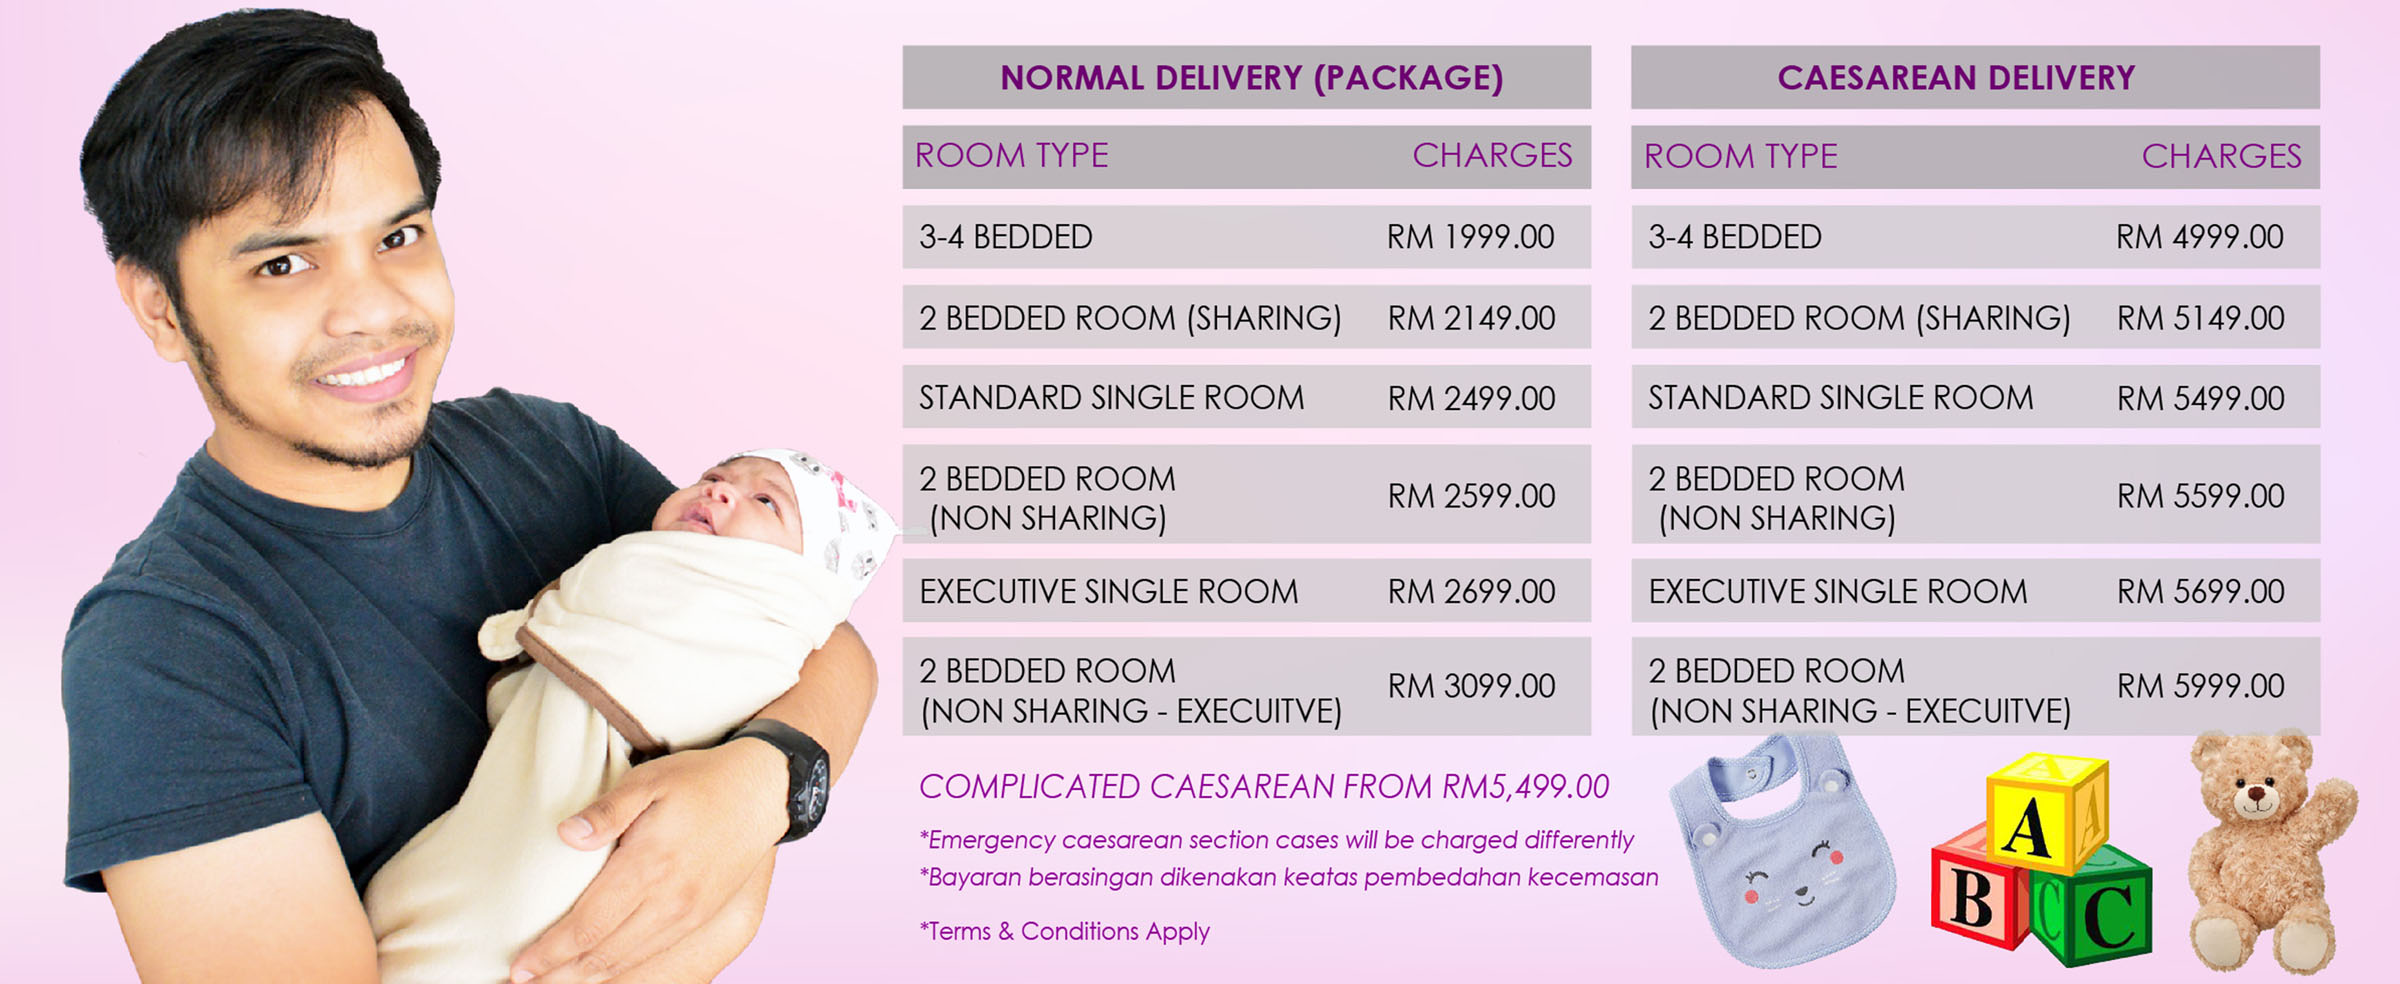 Anggaran Kos Bersalin Normal Dan Caesarean Di Hospital Kerajaan Swasta Lembah Klang Pamapedia